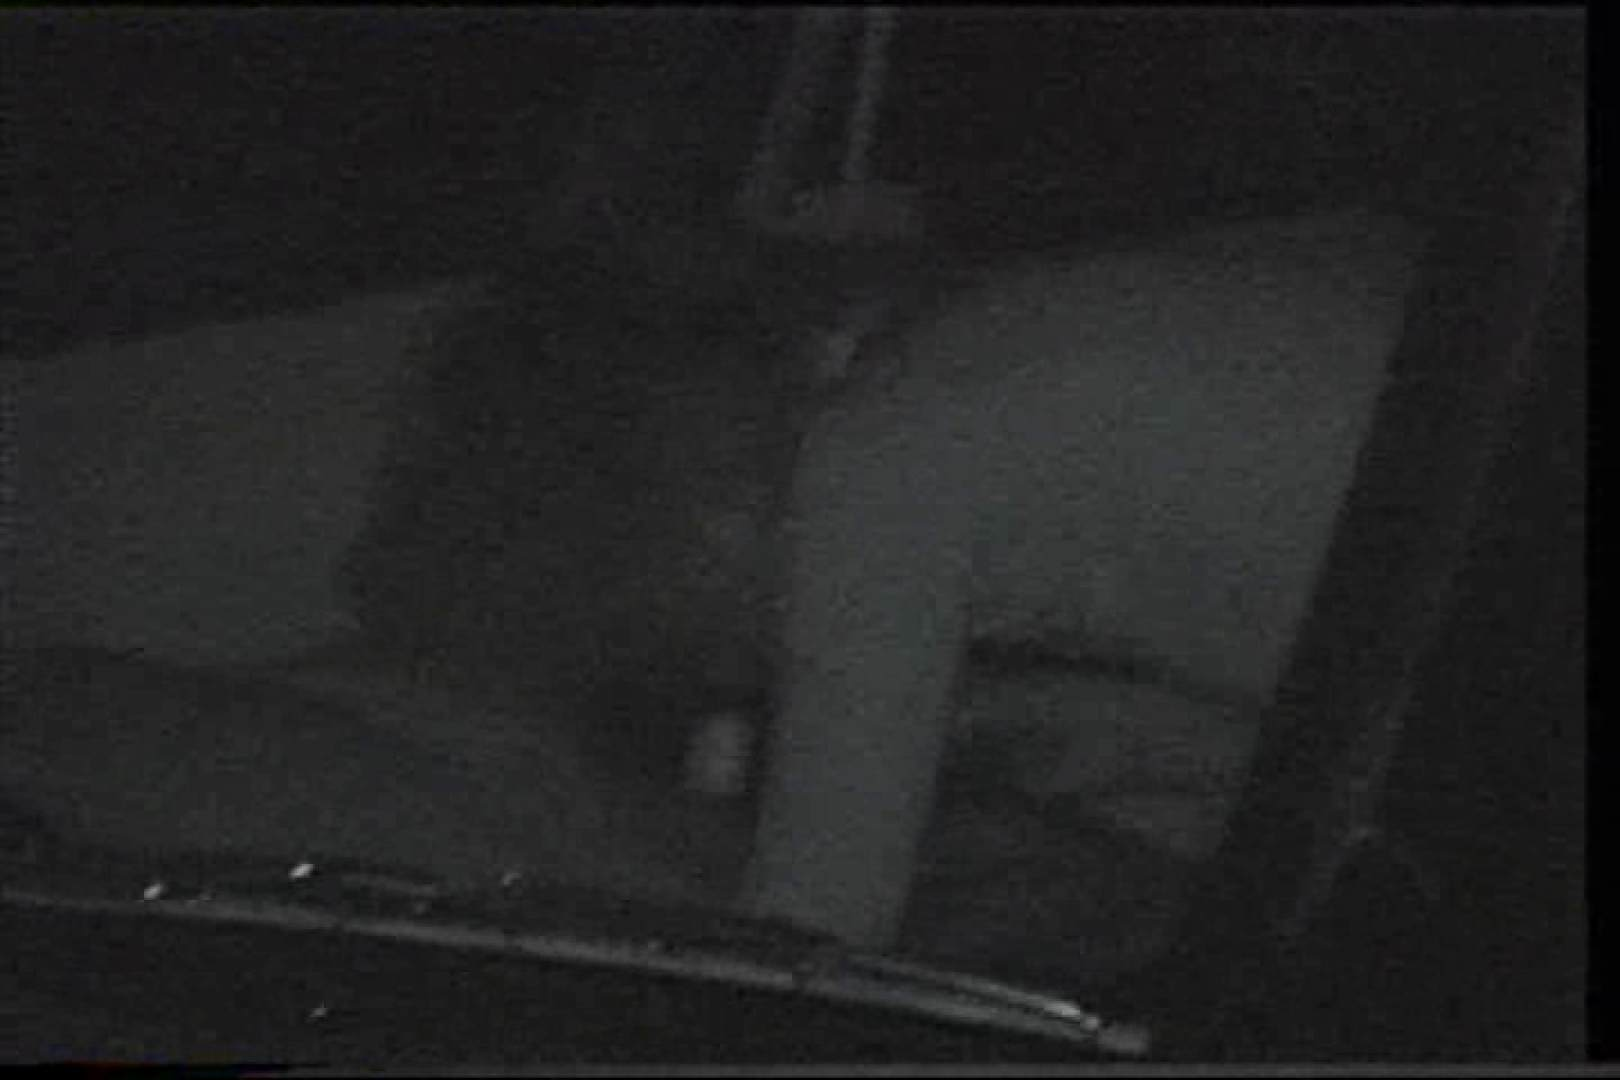 MASAさんの待ち伏せ撮り! 赤外線カーセックスVol.3 盗撮 ワレメ動画紹介 71pic 63